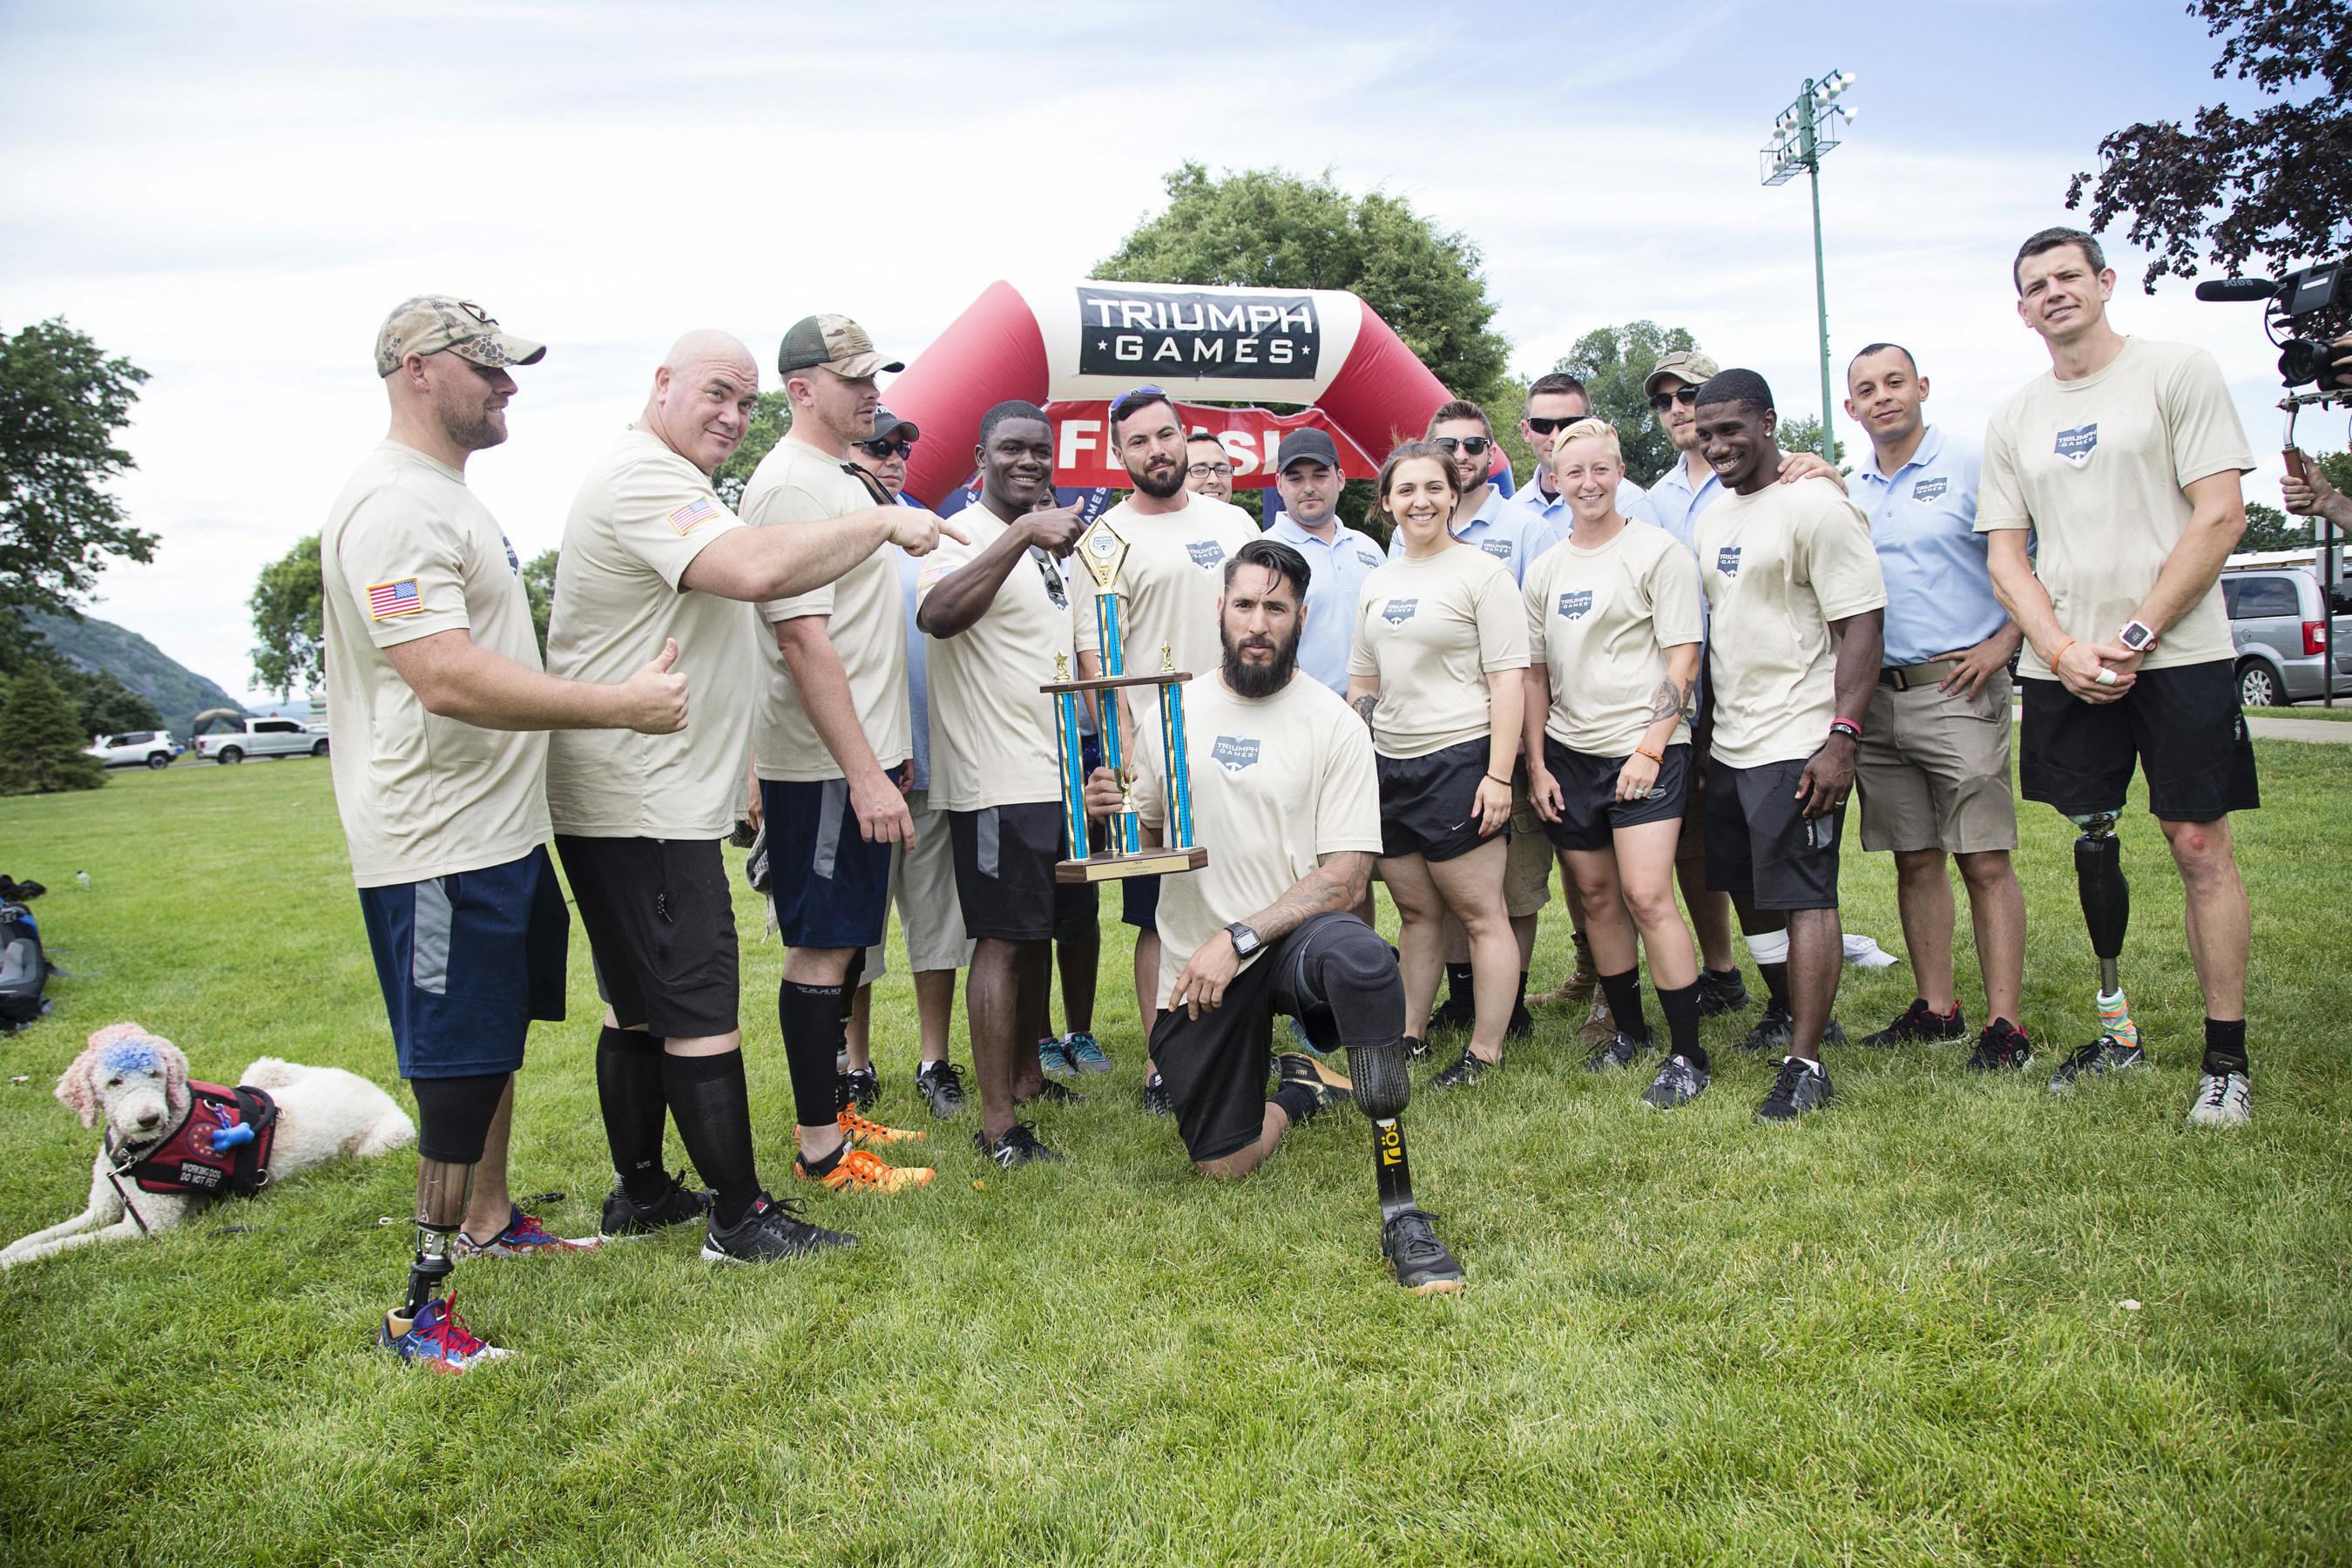 2016 Triumph Games team celebrate with champion, Michael Gallardo